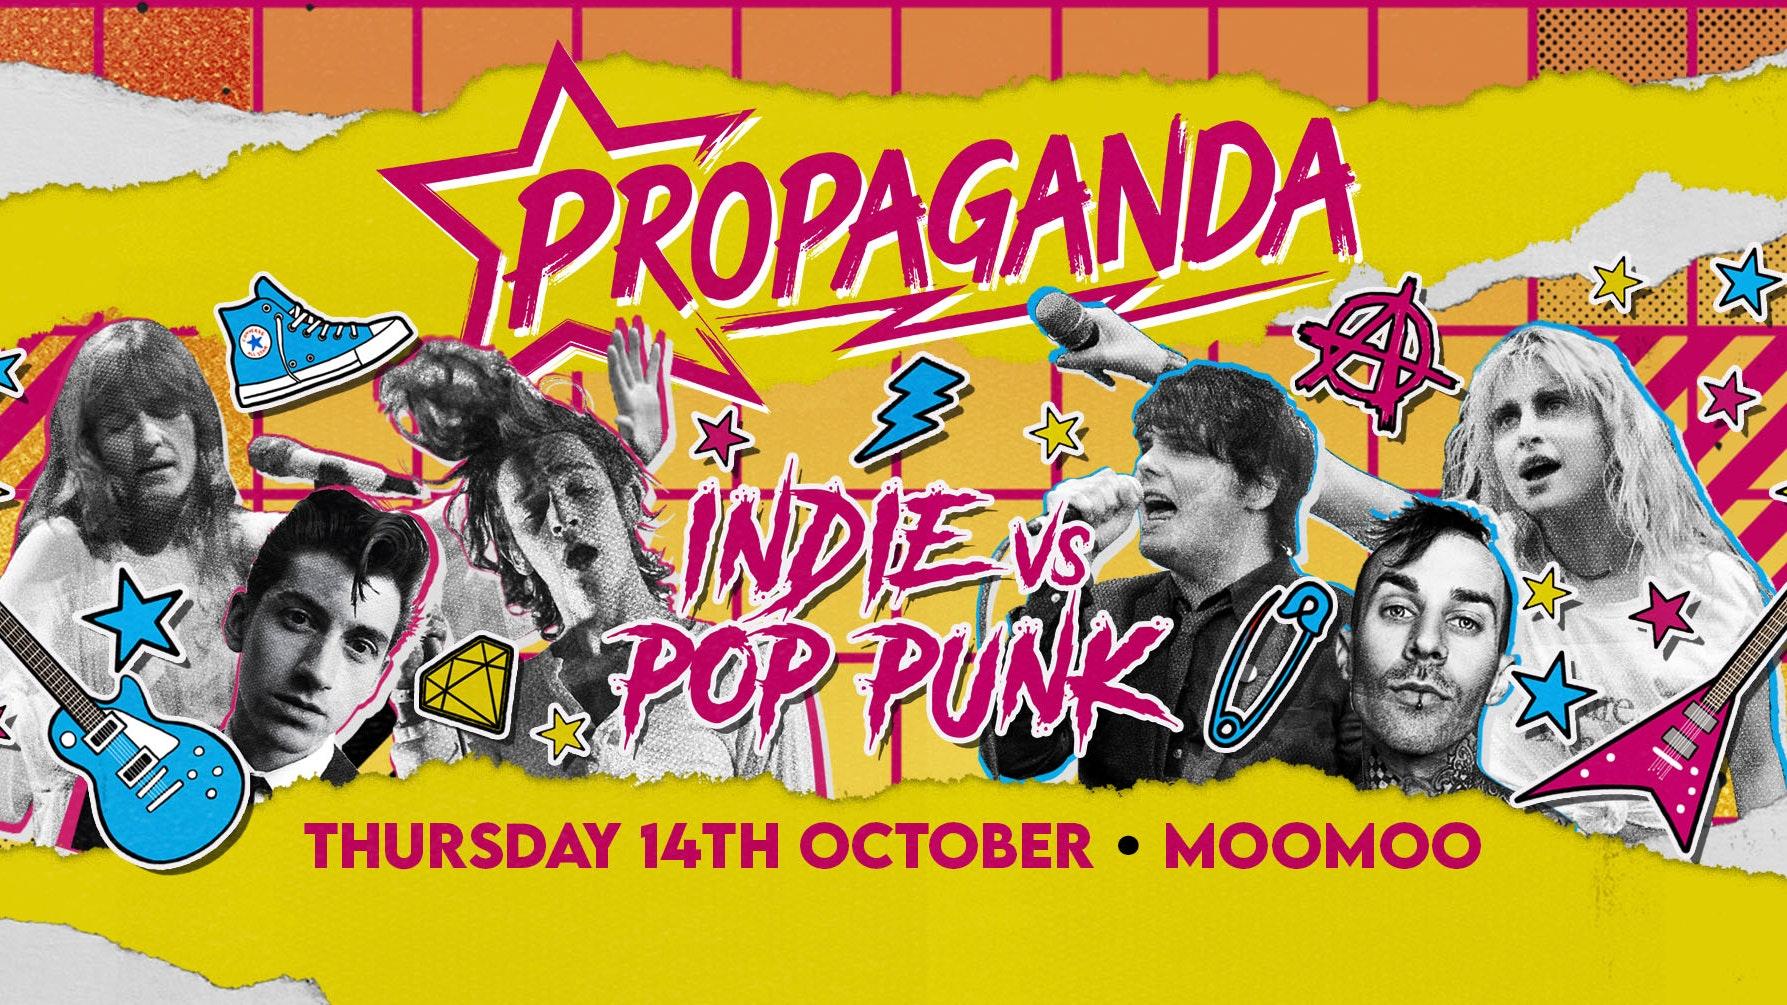 Propaganda Cheltenham – Indie vs Pop-Punk!